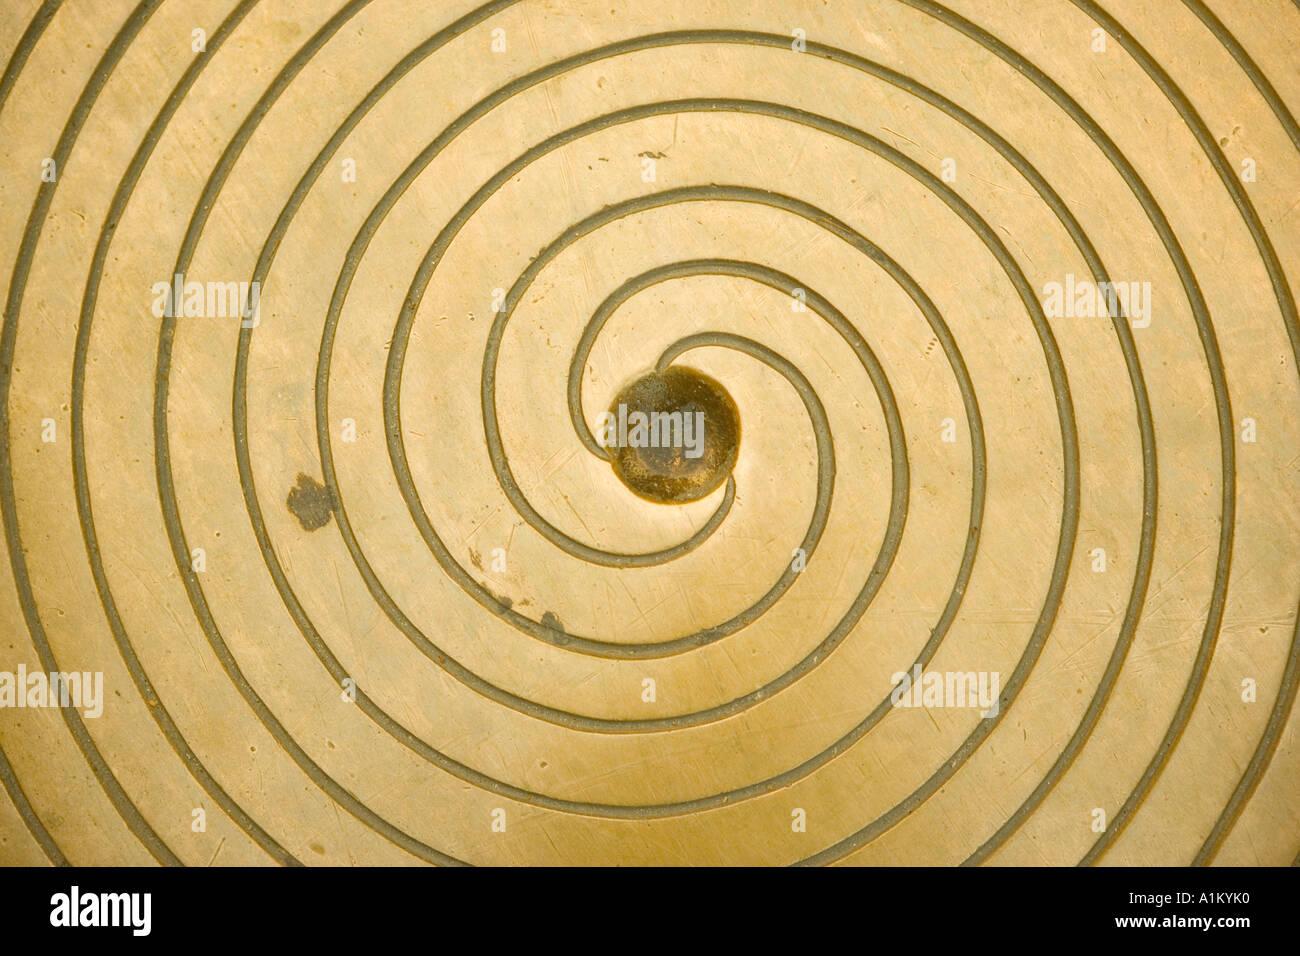 Couvercle avec motif en spirale Photo Stock